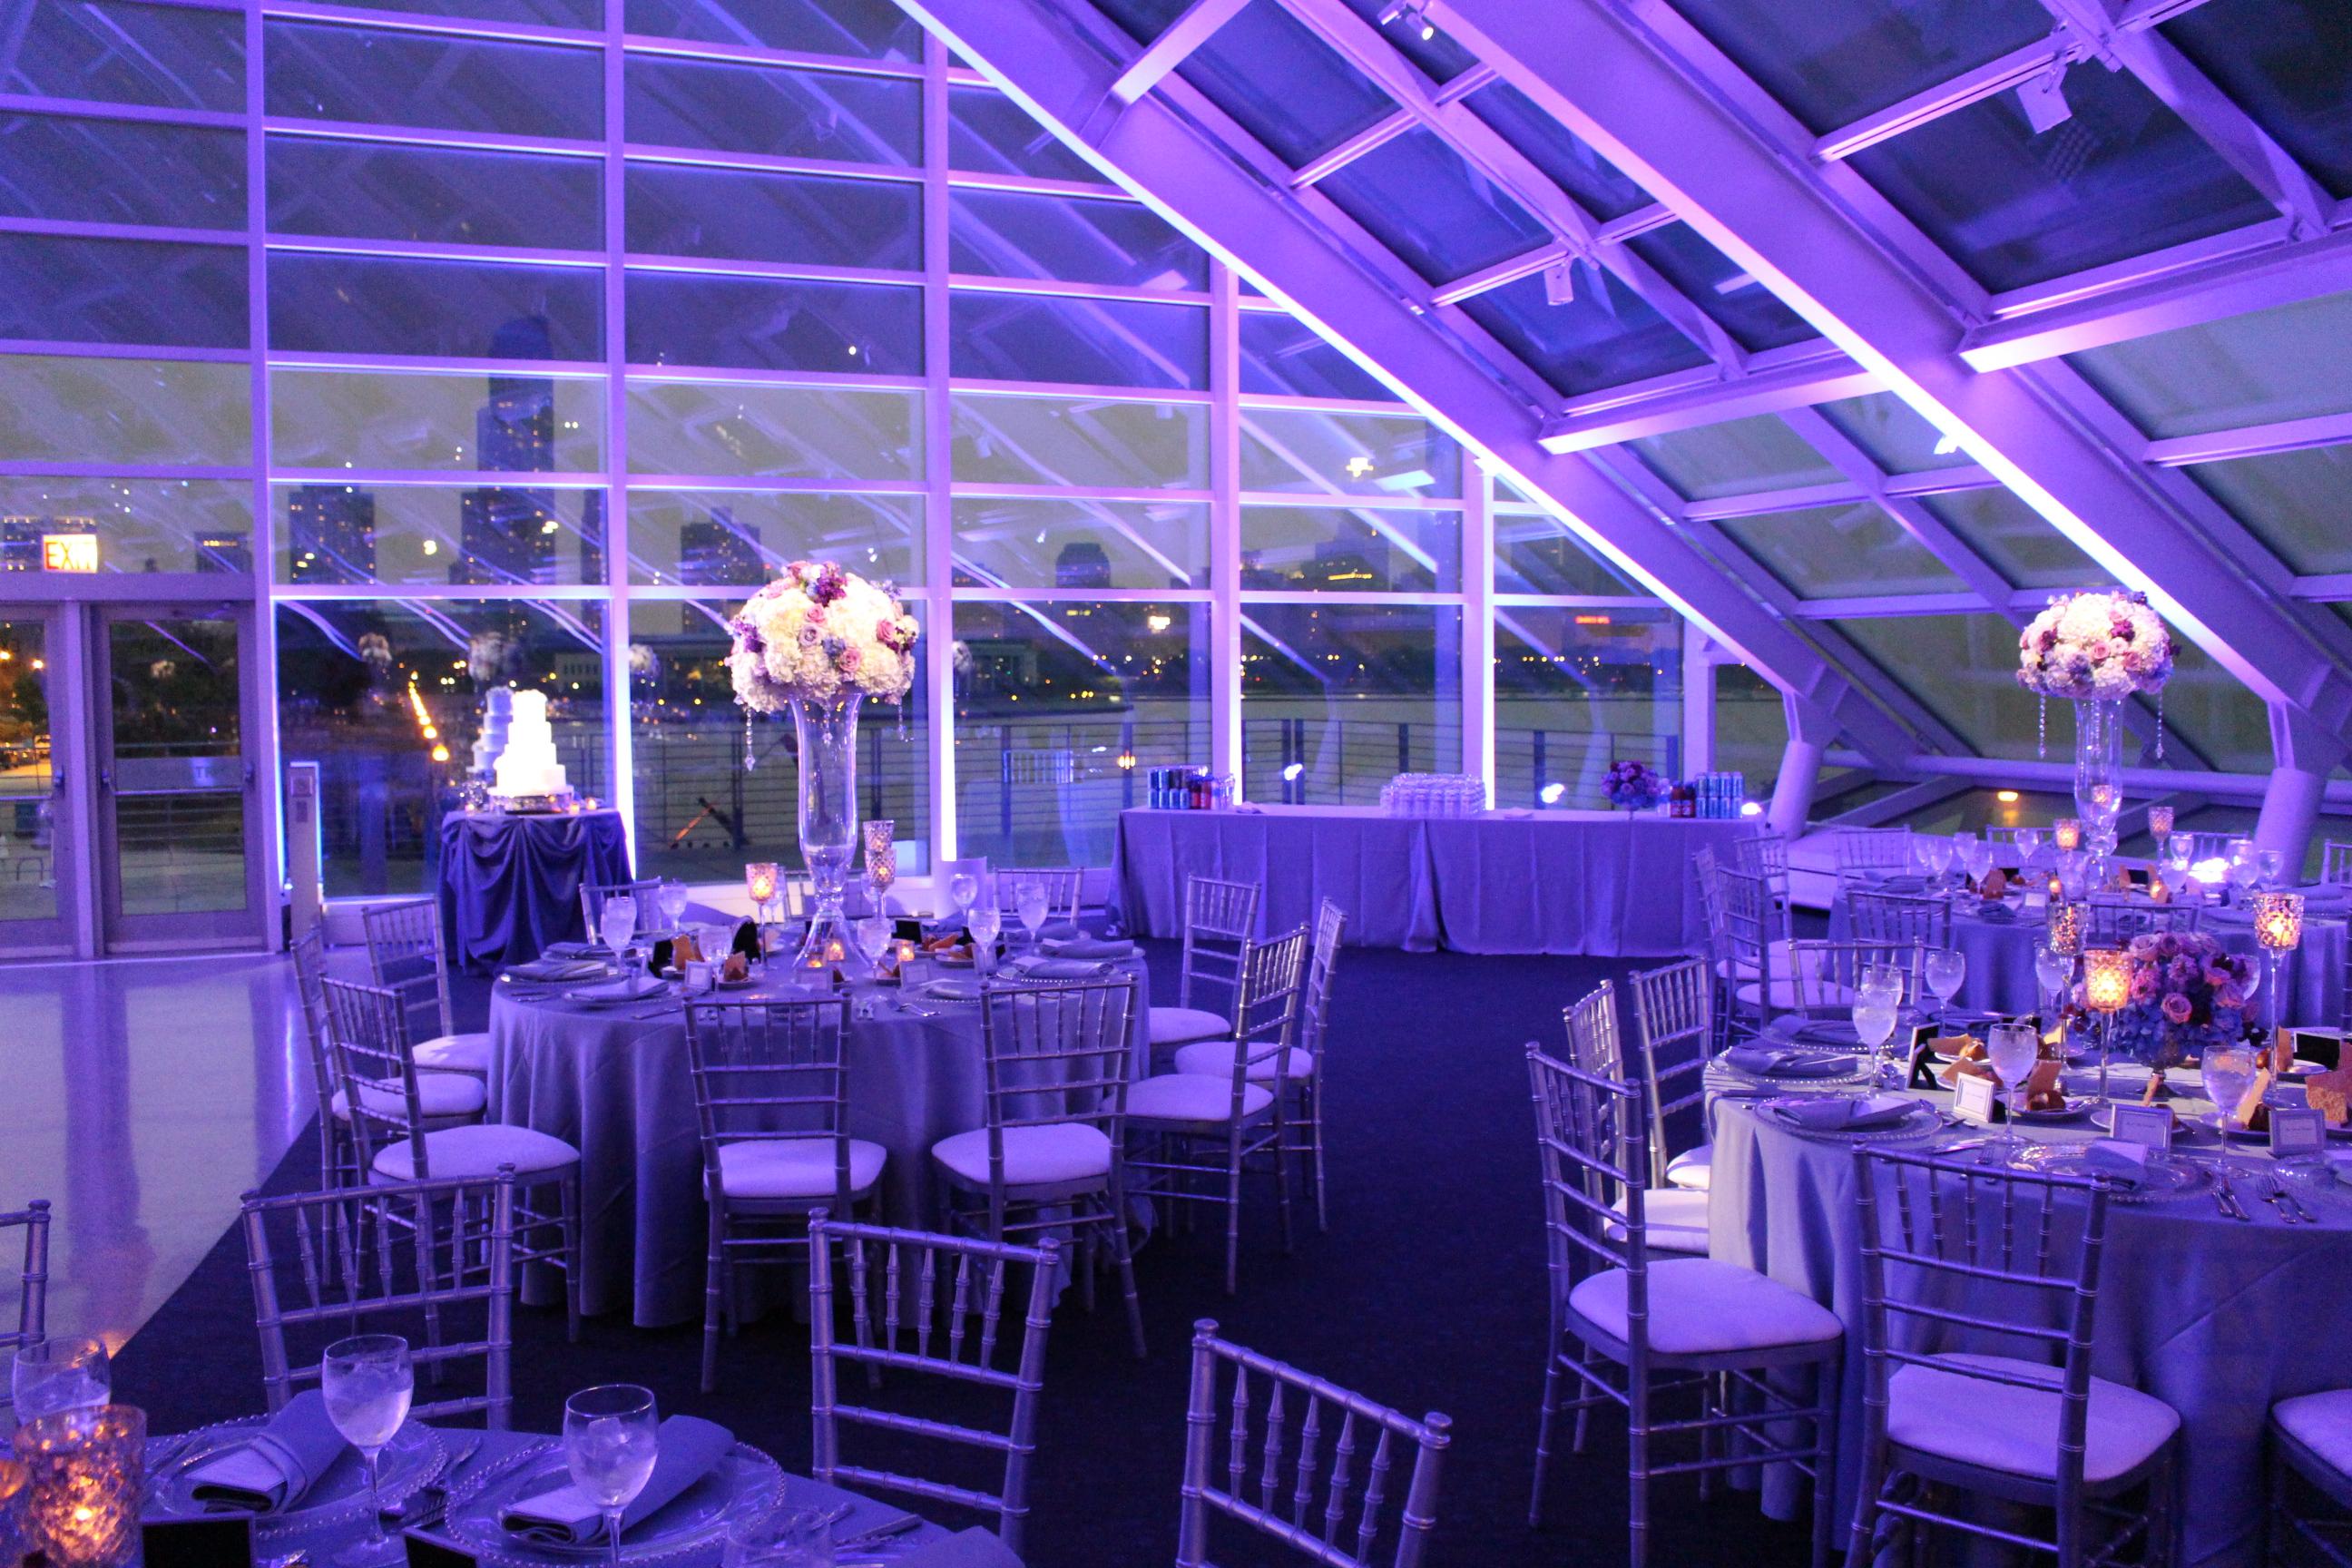 Adler Planetarium Purple Uplighting and Pinspotting - MDM